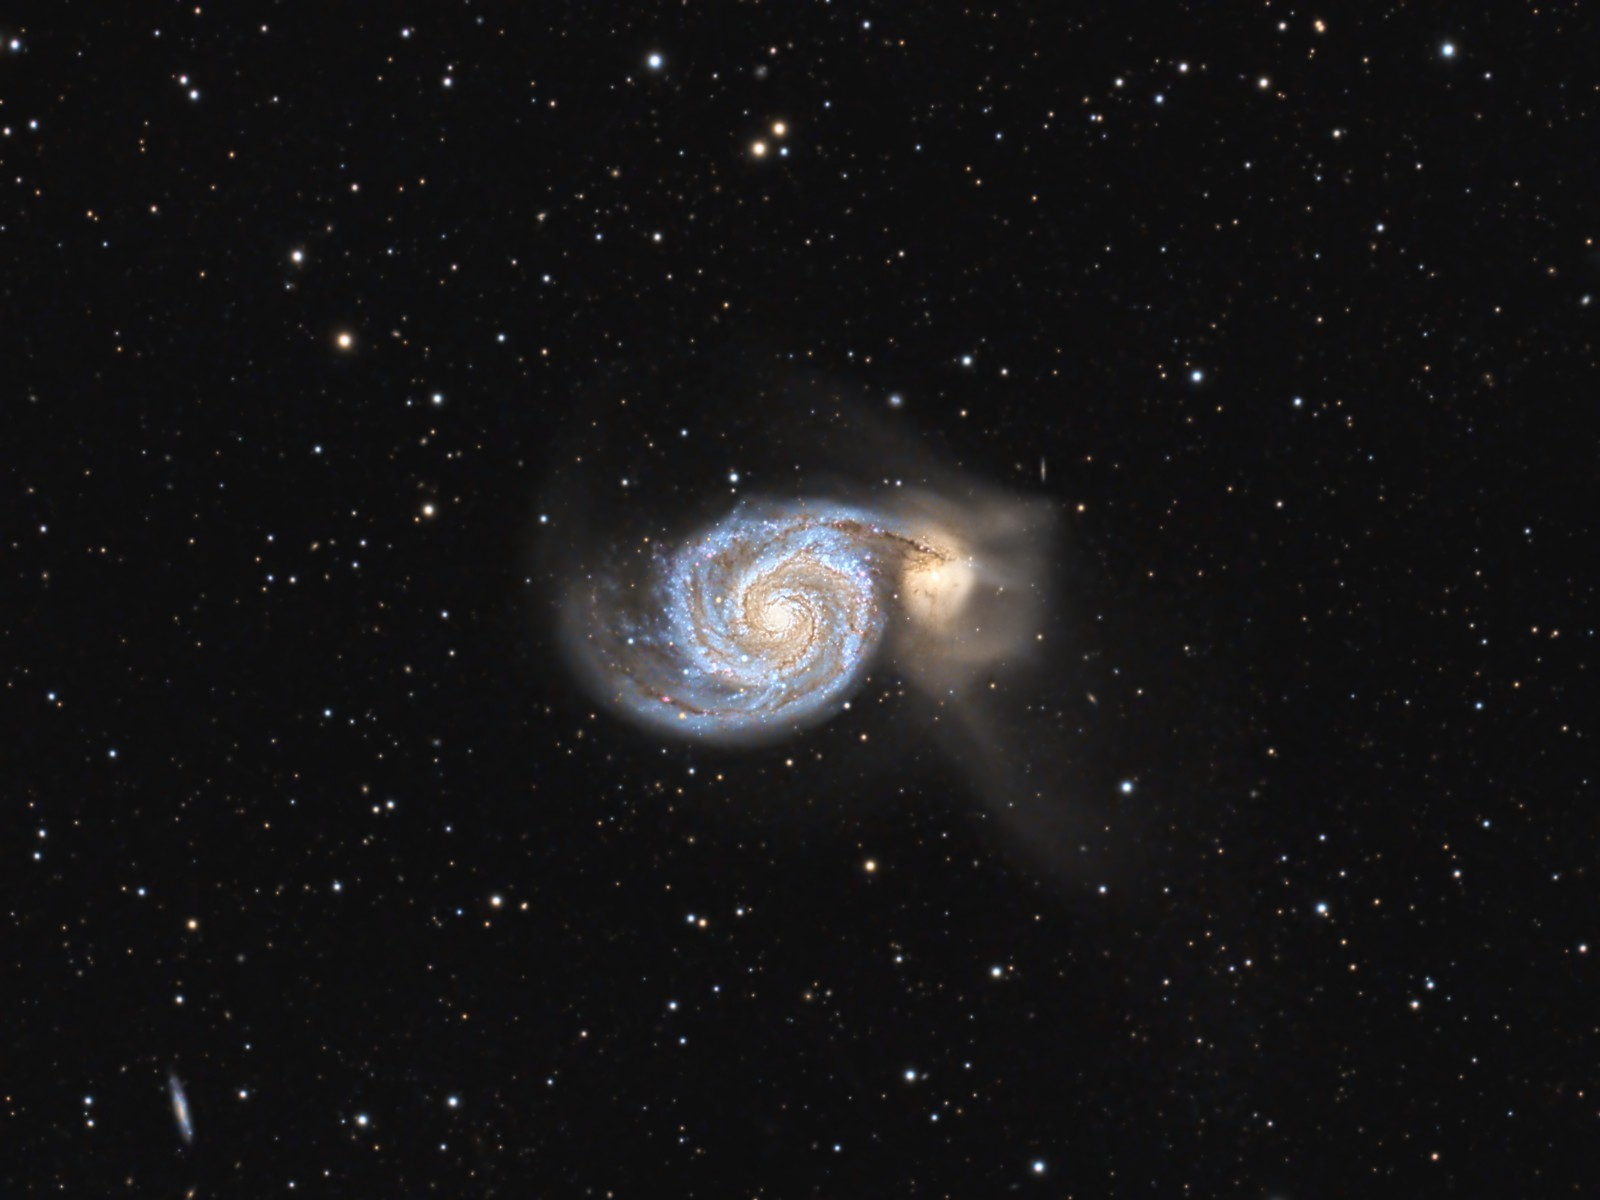 M51, The Whirlpool Galaxy